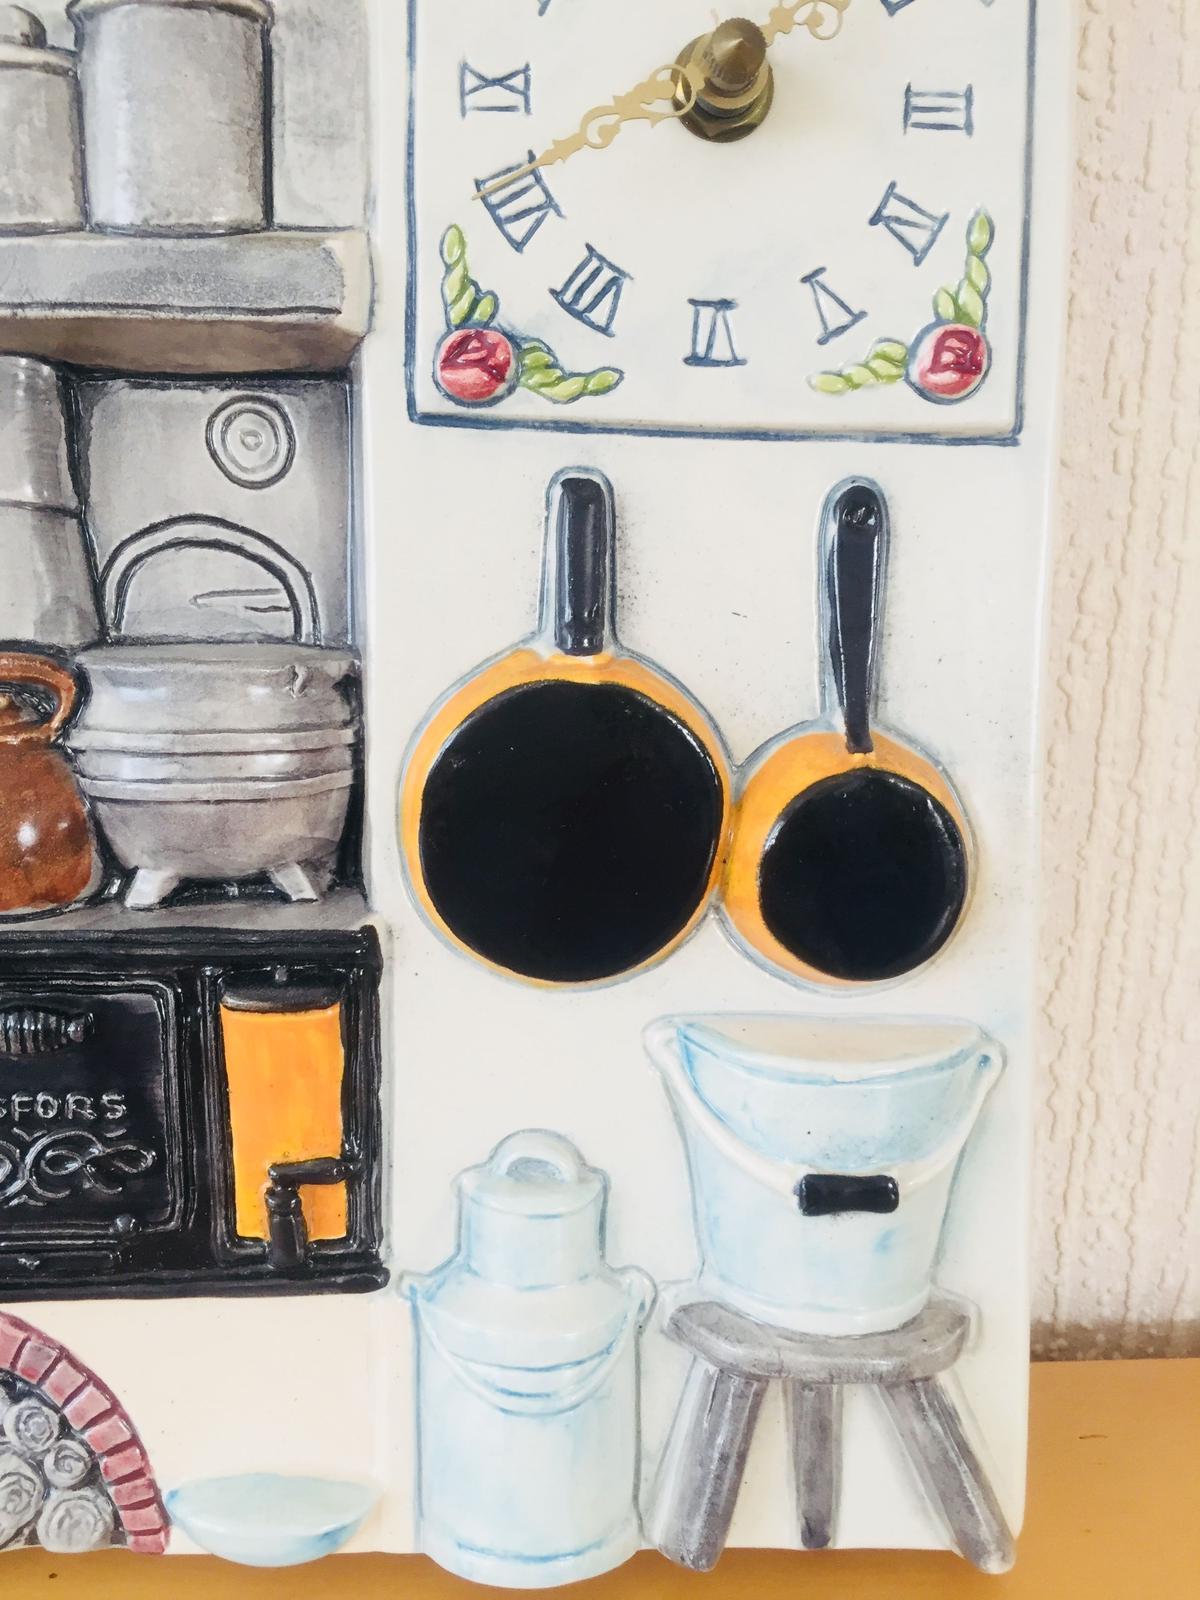 Wasurenagusa            Jie Gantofta/ジィ ガントフタ/陶板/時計/レトロ昔、スウェーデンのキッチンの風景